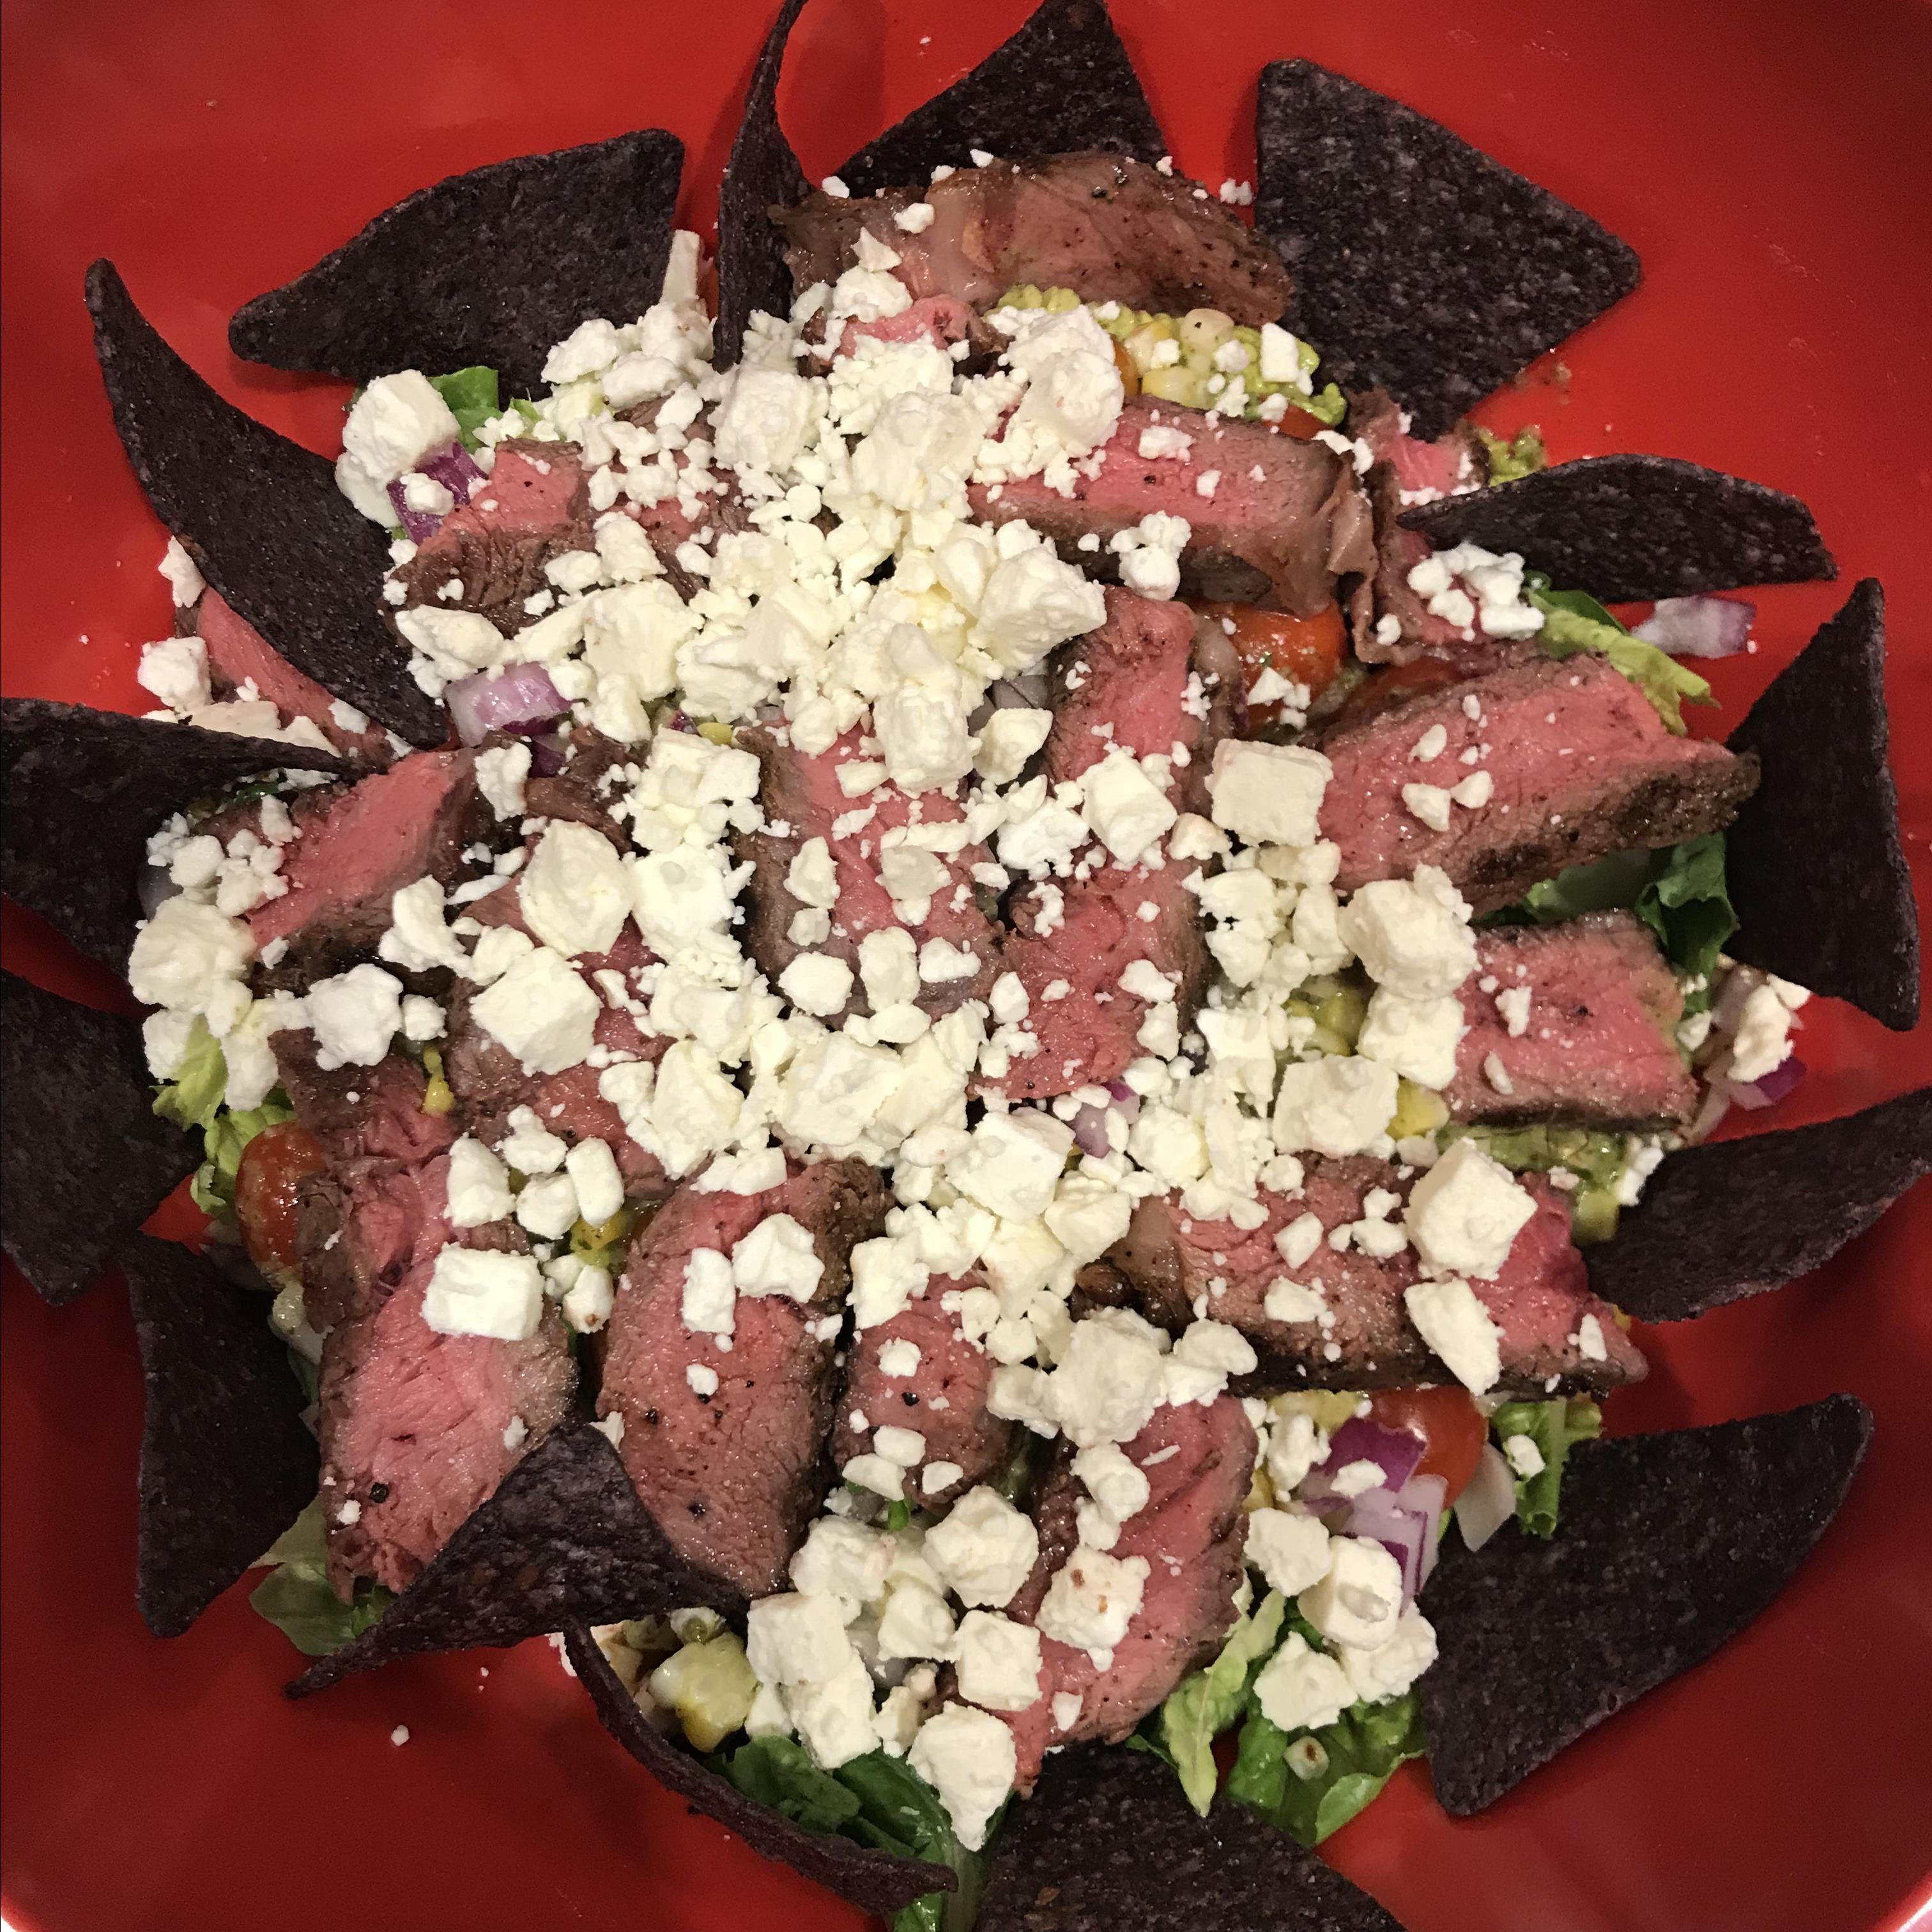 Cilantro-Lime Steak Salad jennylj